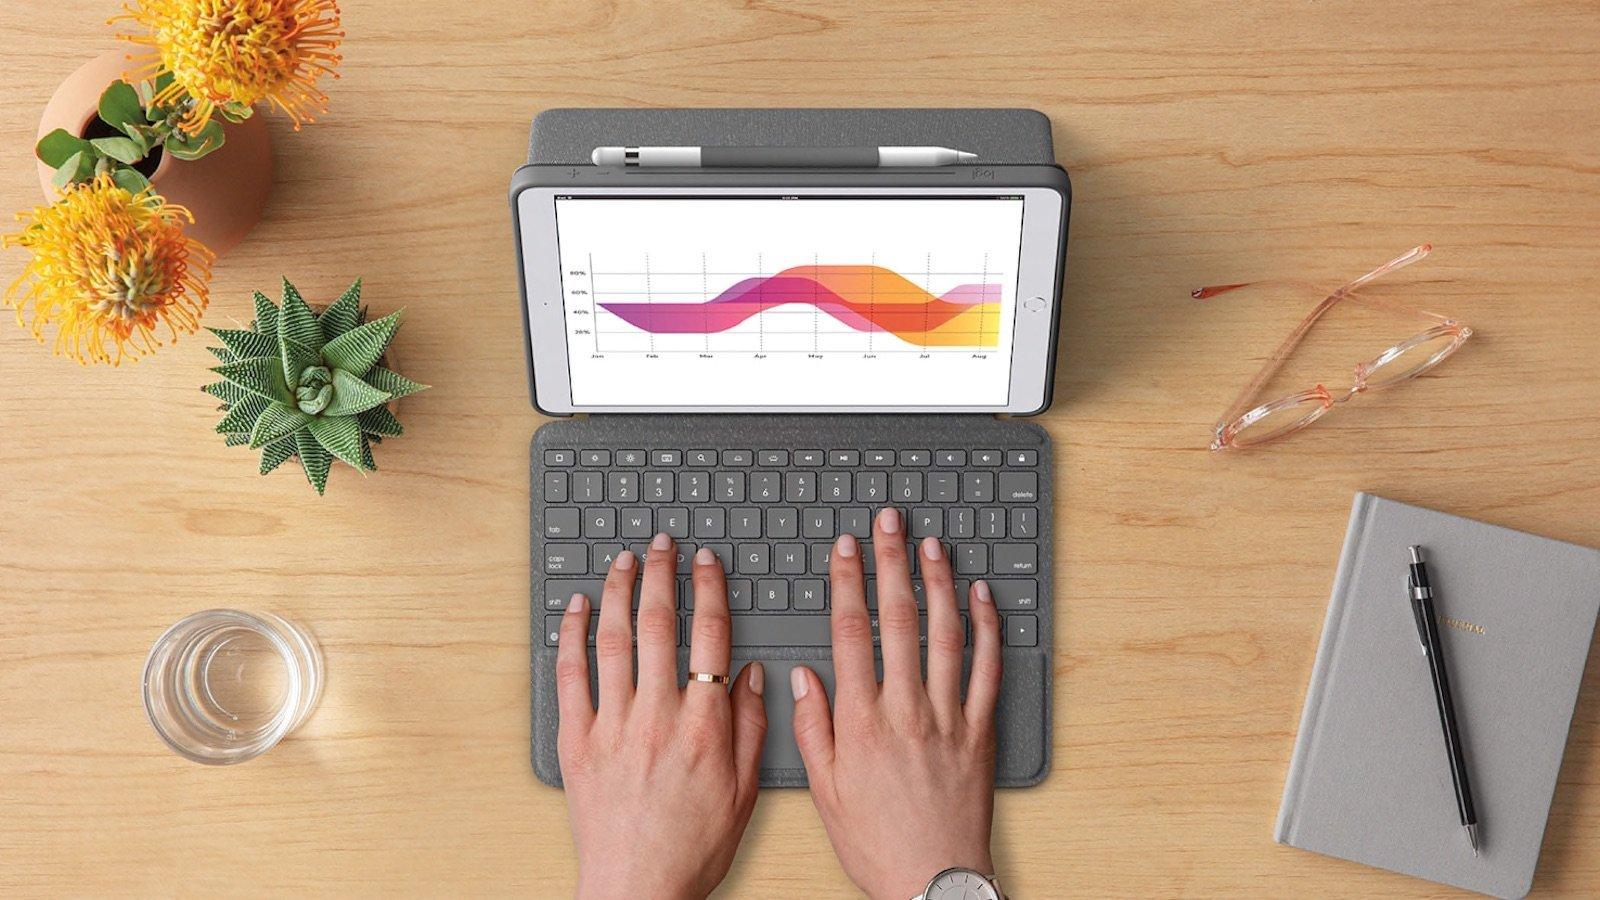 The Best iPad Pro keyboards